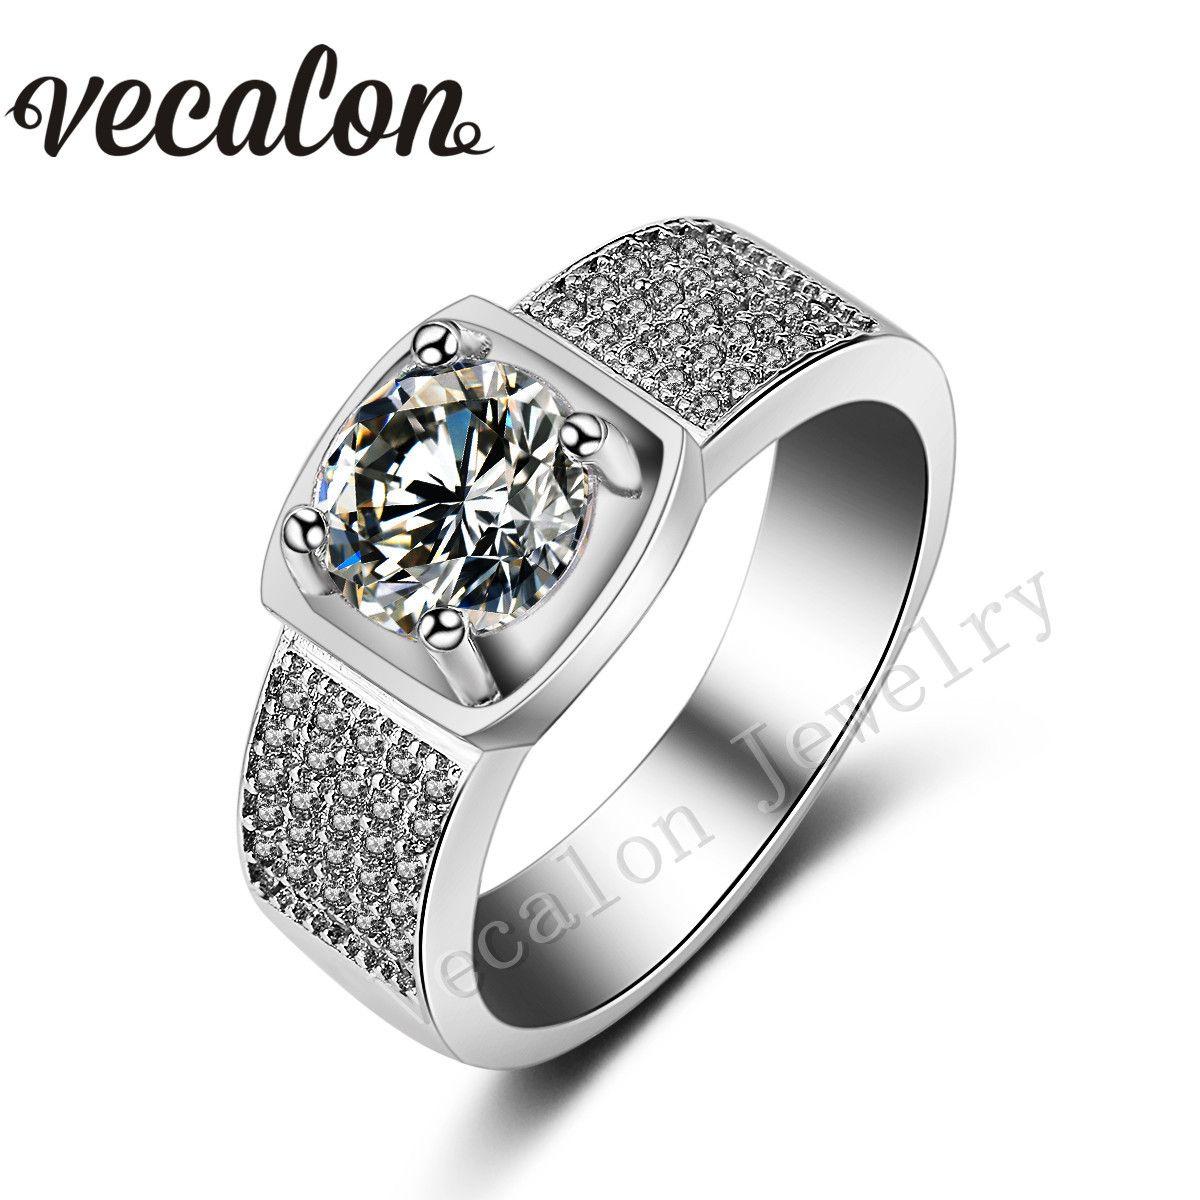 Vecalon ذكر حزب الدائري جولة 3ct توباز مقلد الماس تشيكوسلوفاكيا 925 فضة الاشتباك خاتم الزواج للرجال Sz 8-13